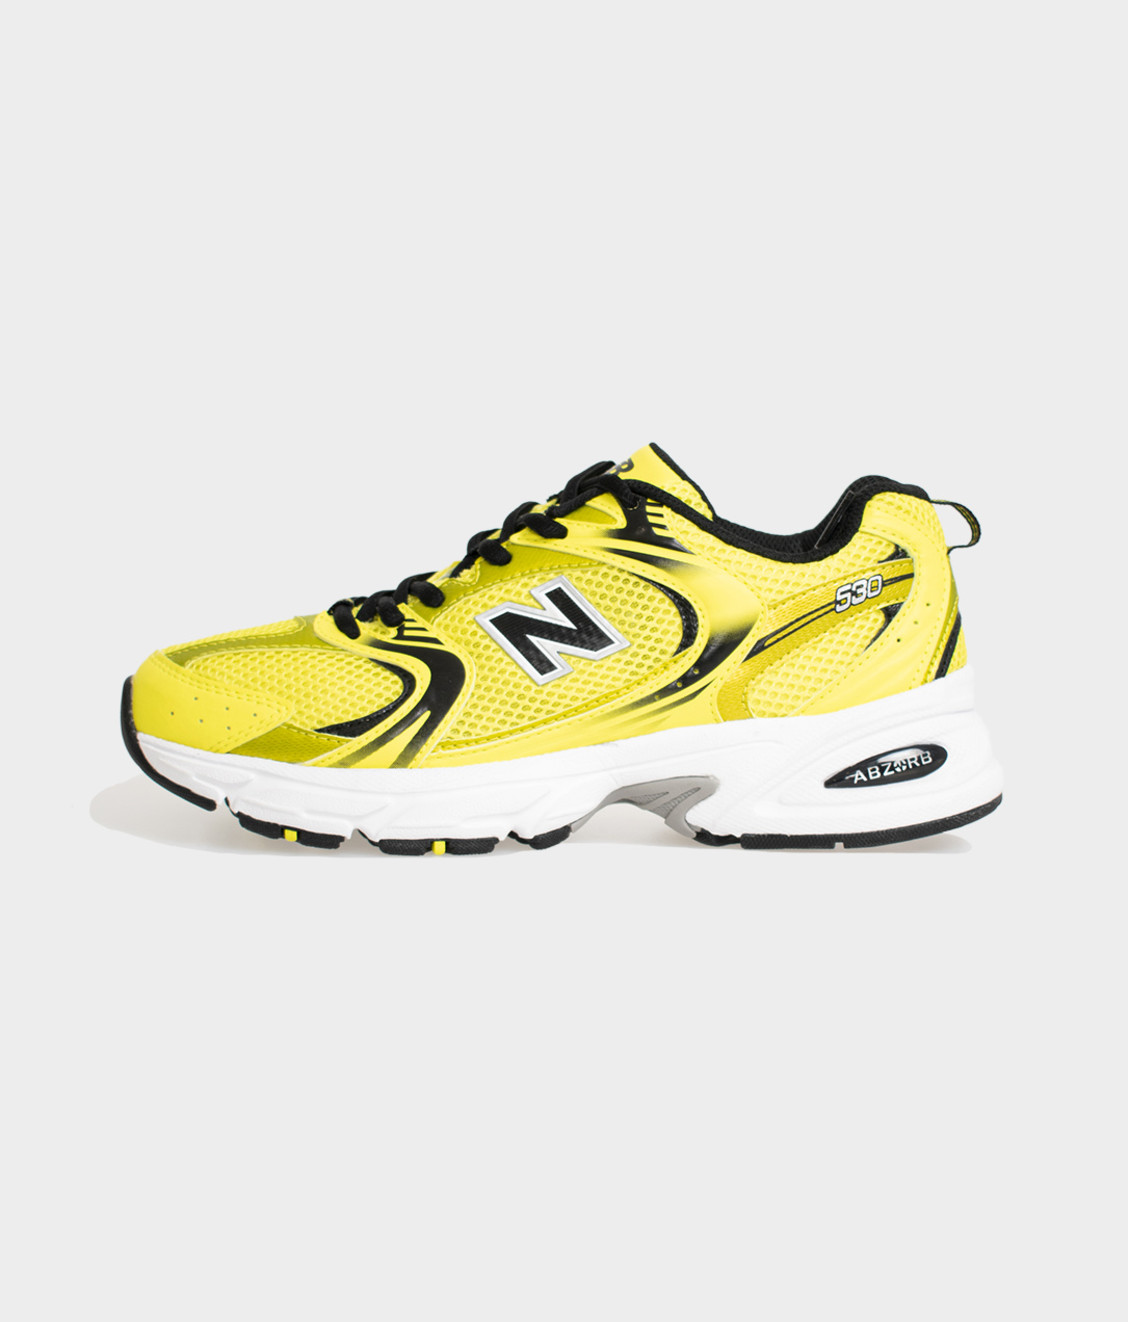 New Balance 530 Yellow/Black